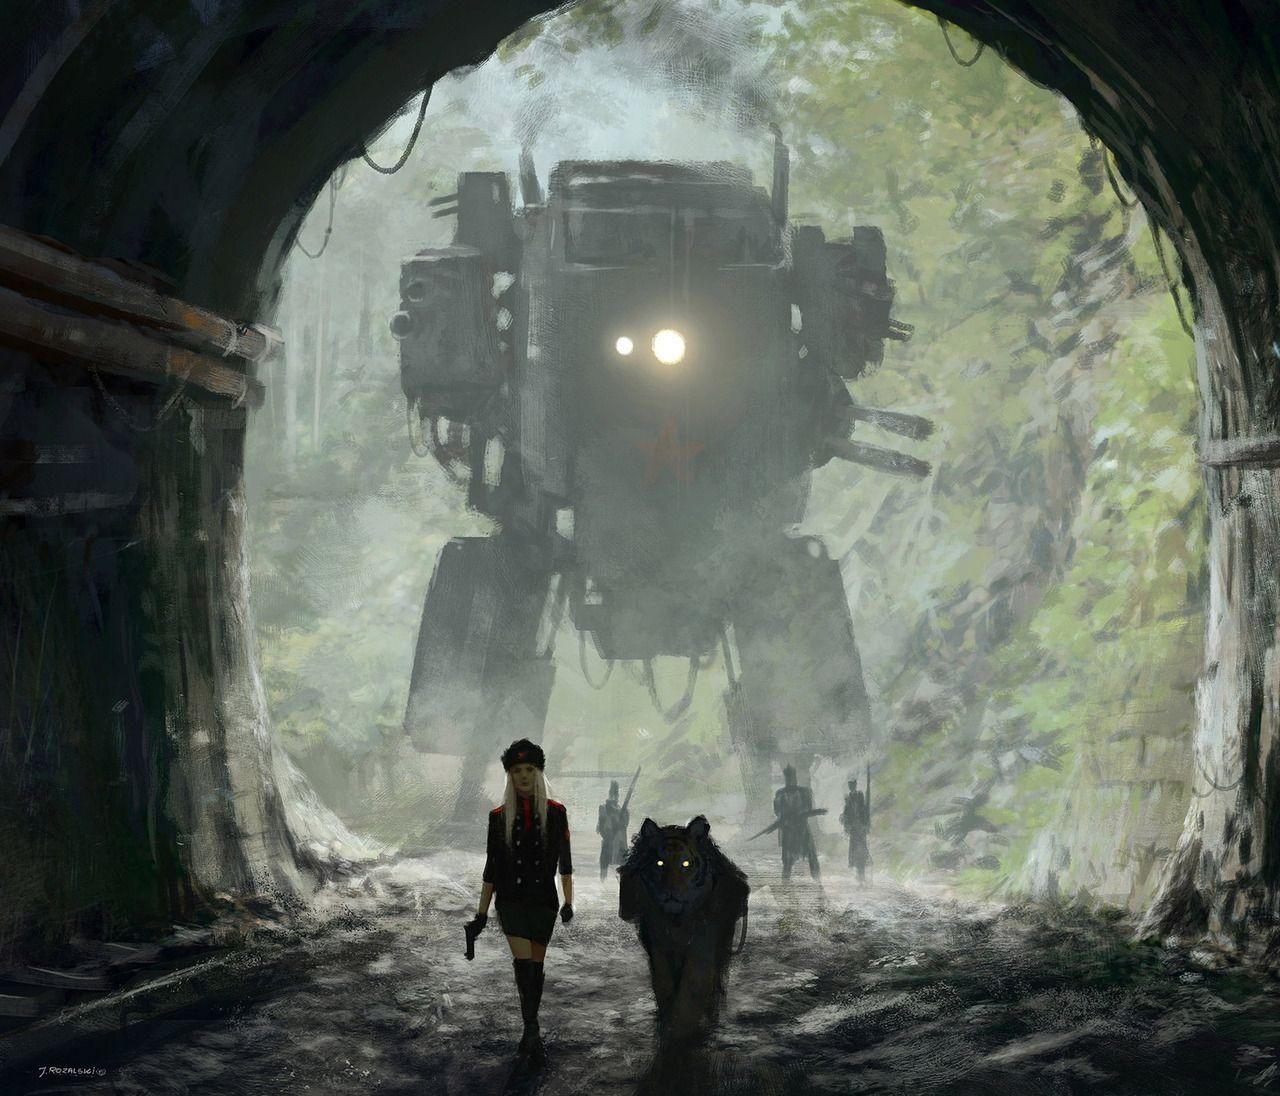 #futuristic #robots #digitalart #digitalpainting #apocalyptic